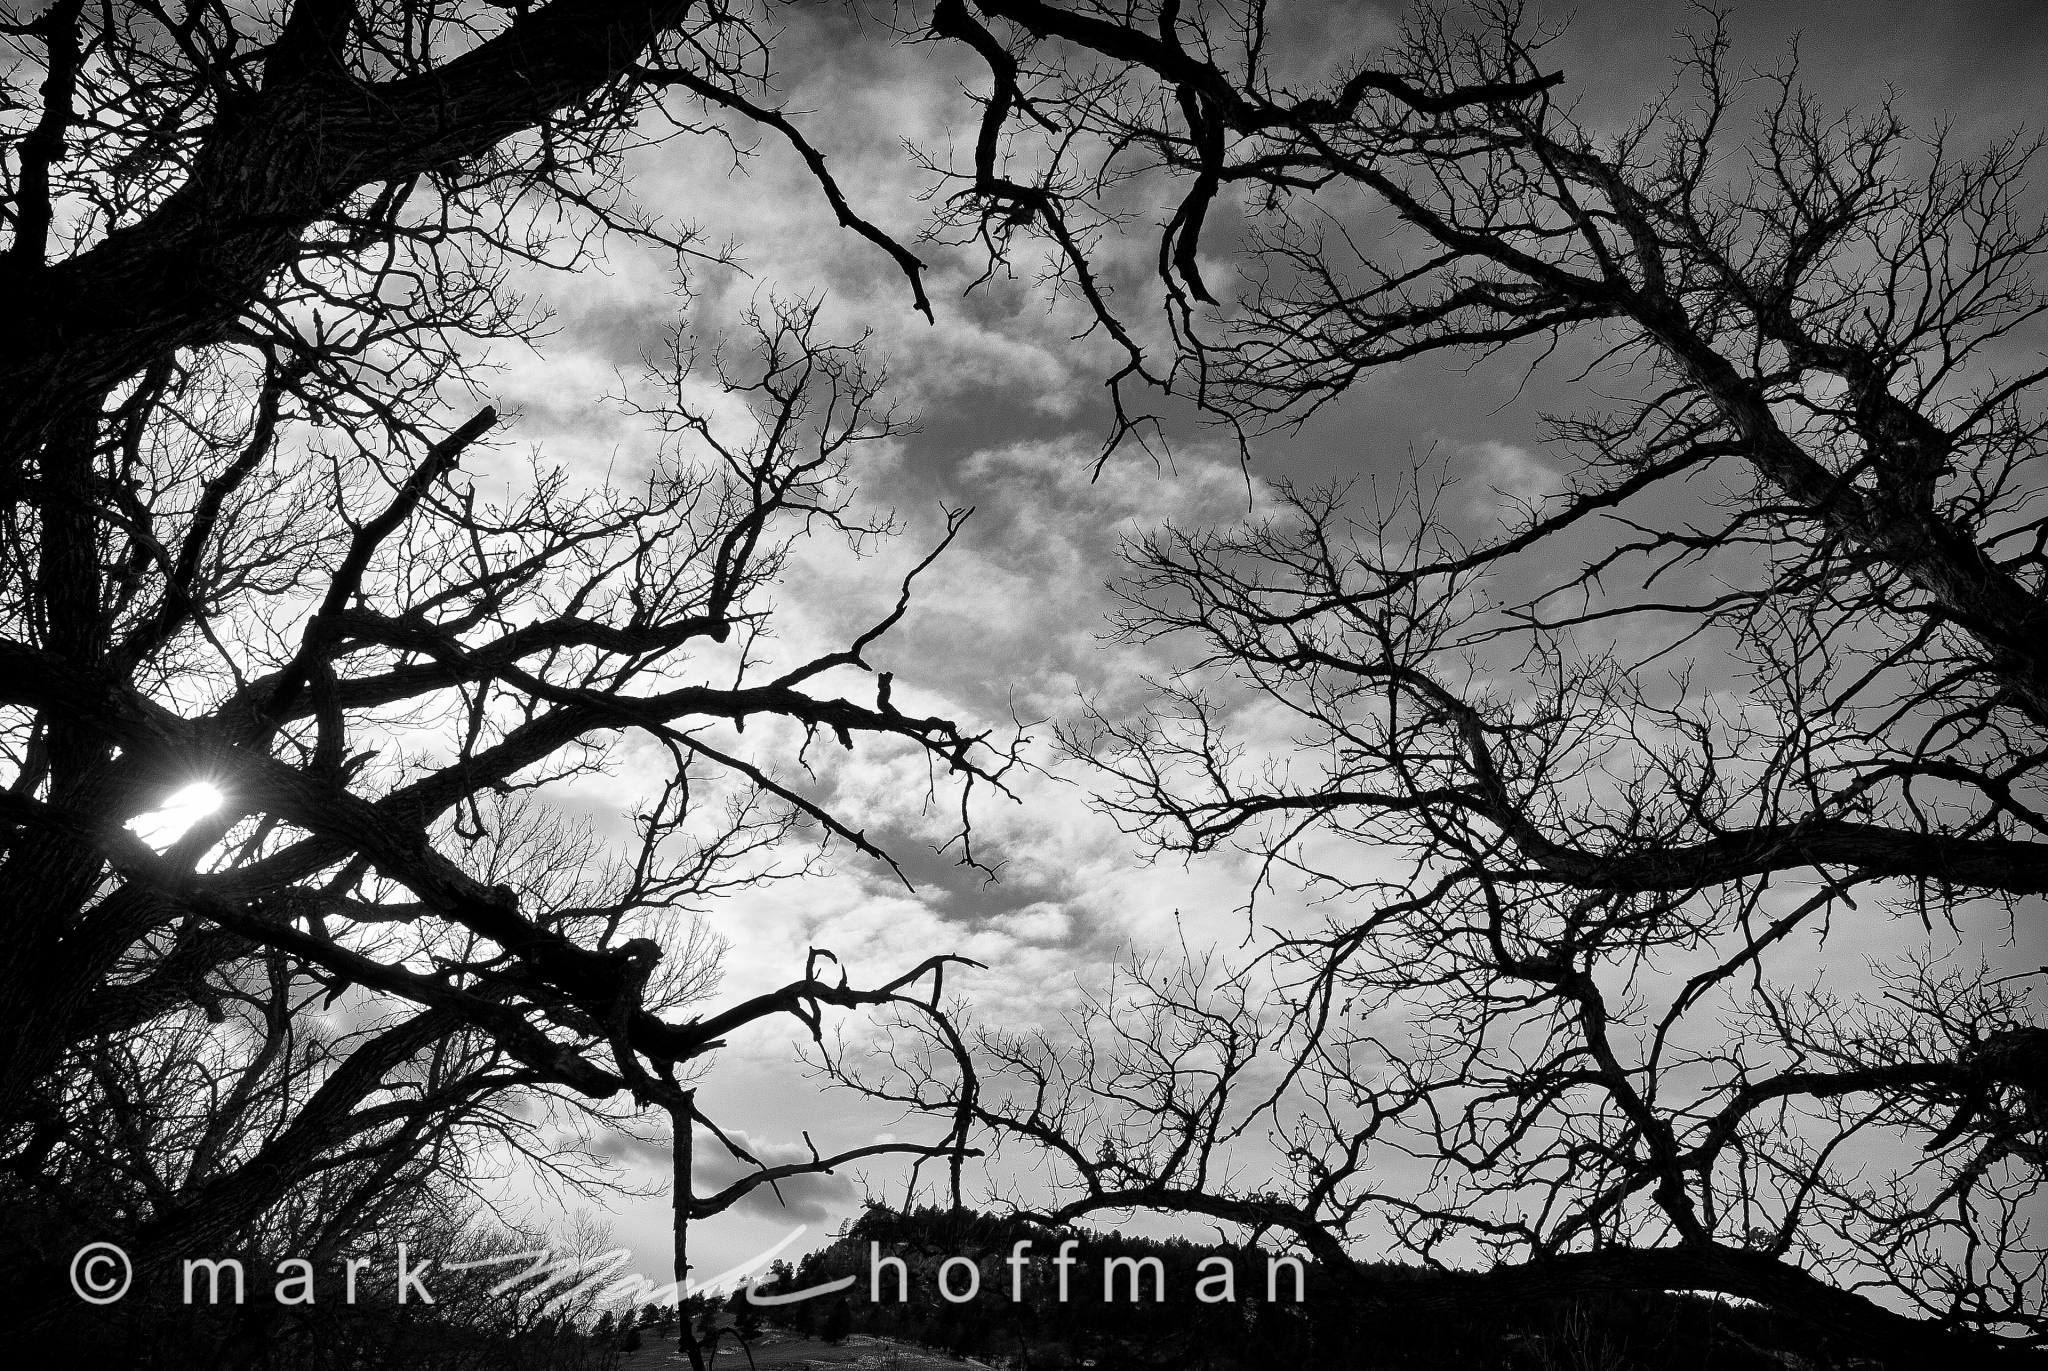 Mark_Hoffman_ND25907_Edit_cap1_var1.jpg